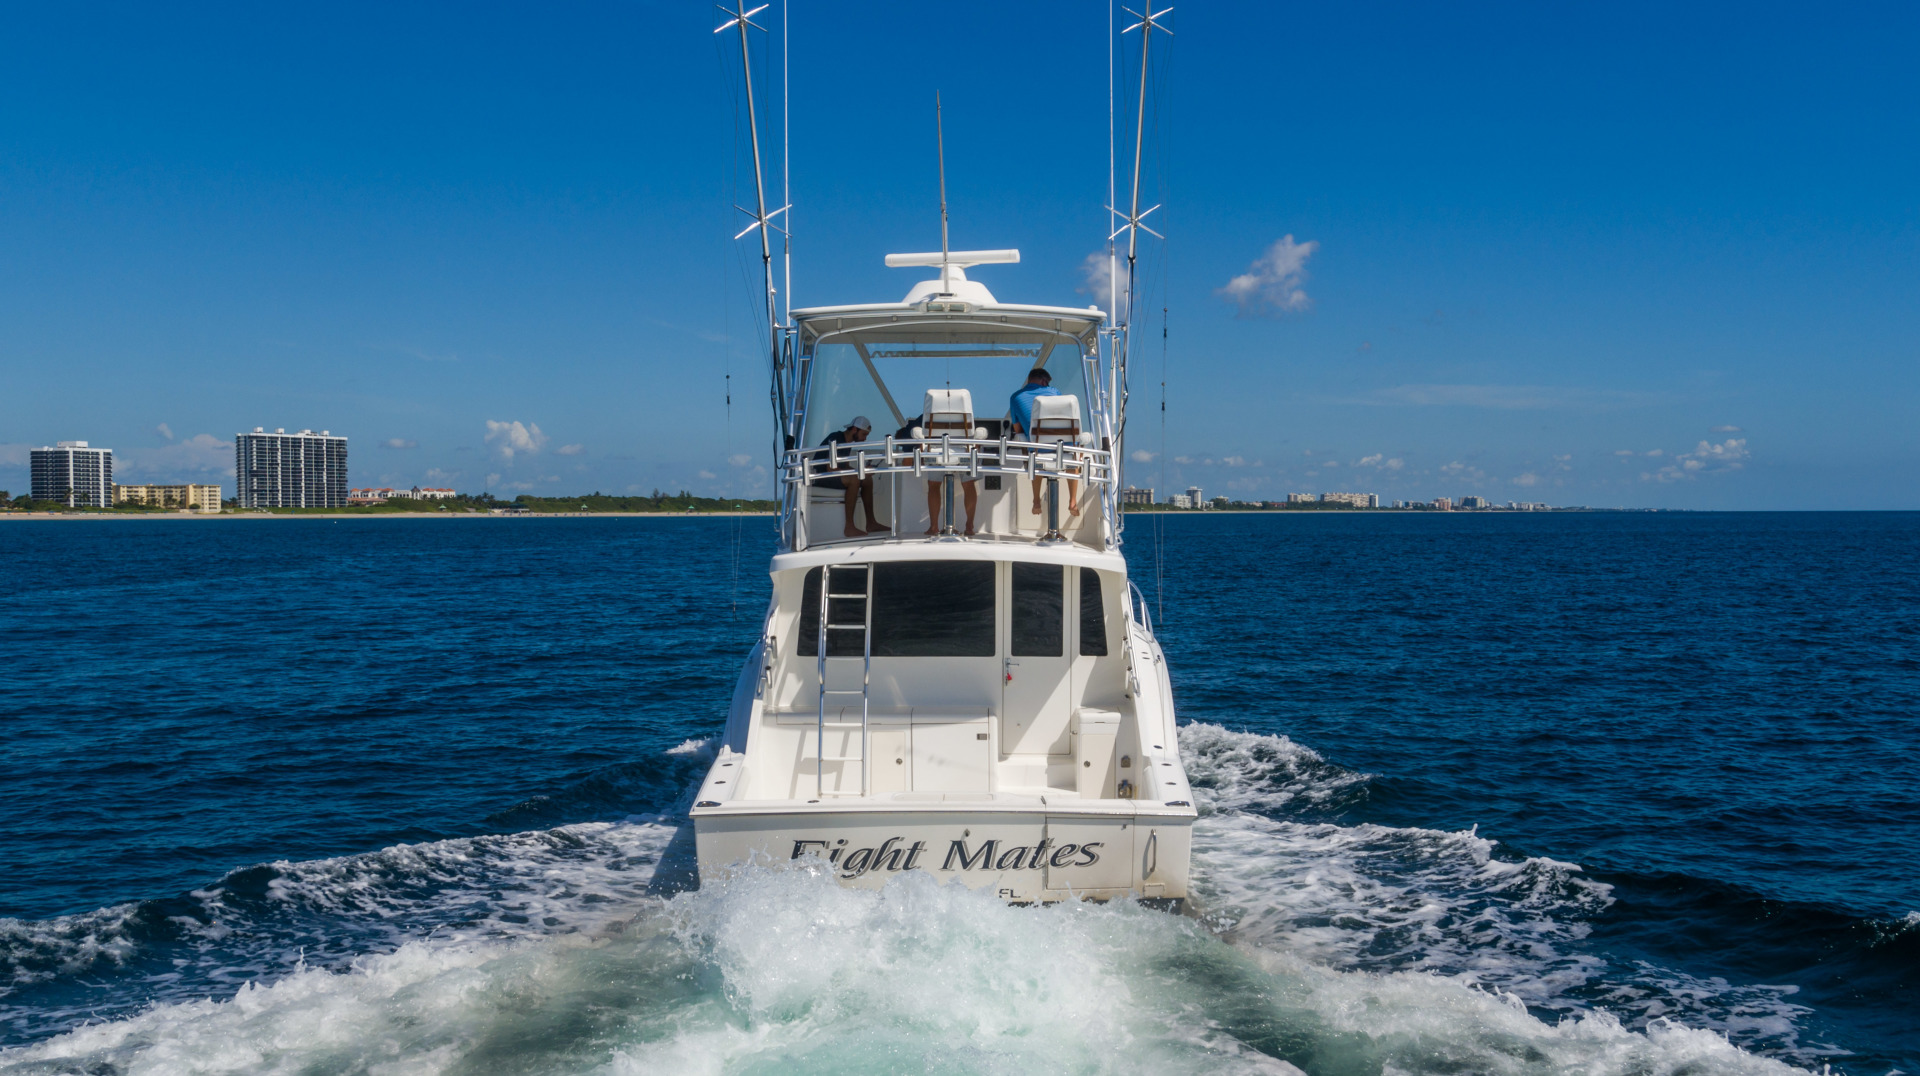 Cabo-Fly 2009-Eight Mates Boca Raton-Florida-United States-1486184 | Thumbnail